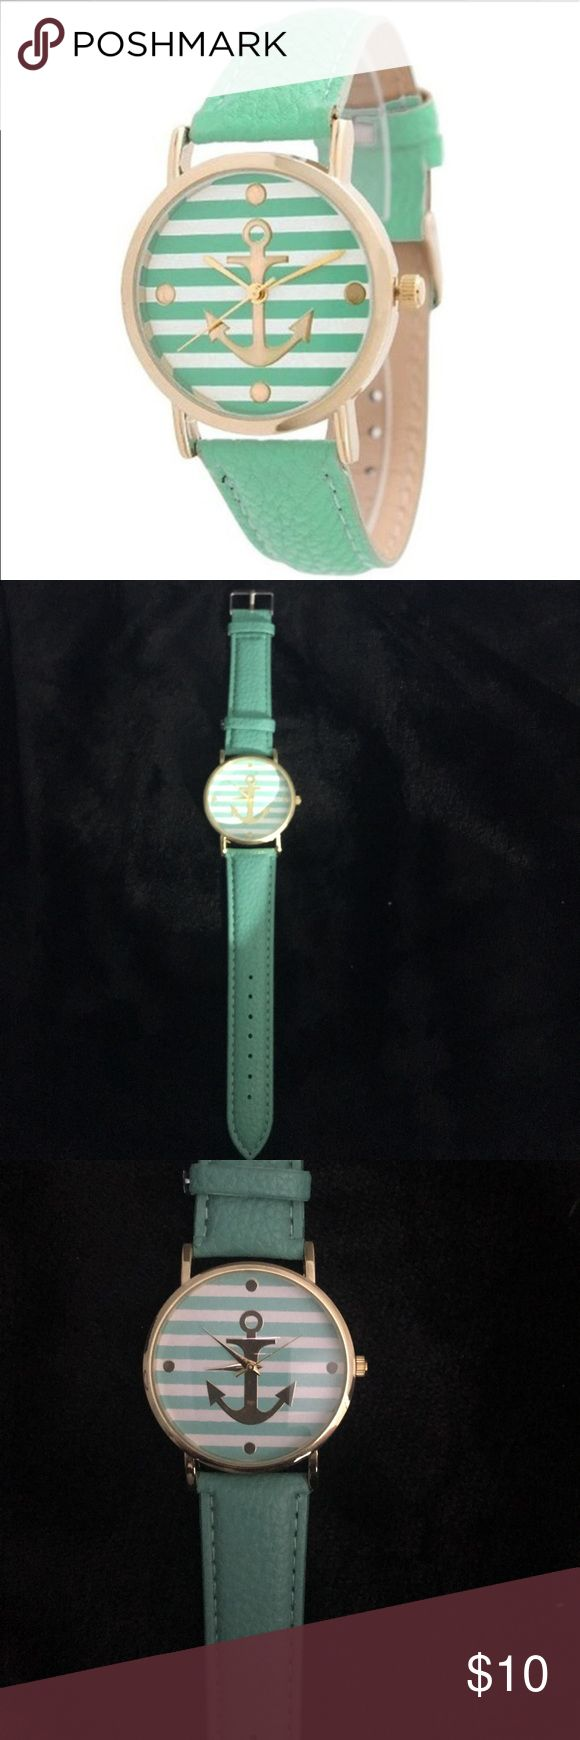 Light Aqua Anchor Nautical Striped Watch New Beautiful anchor watch Accessories Watches